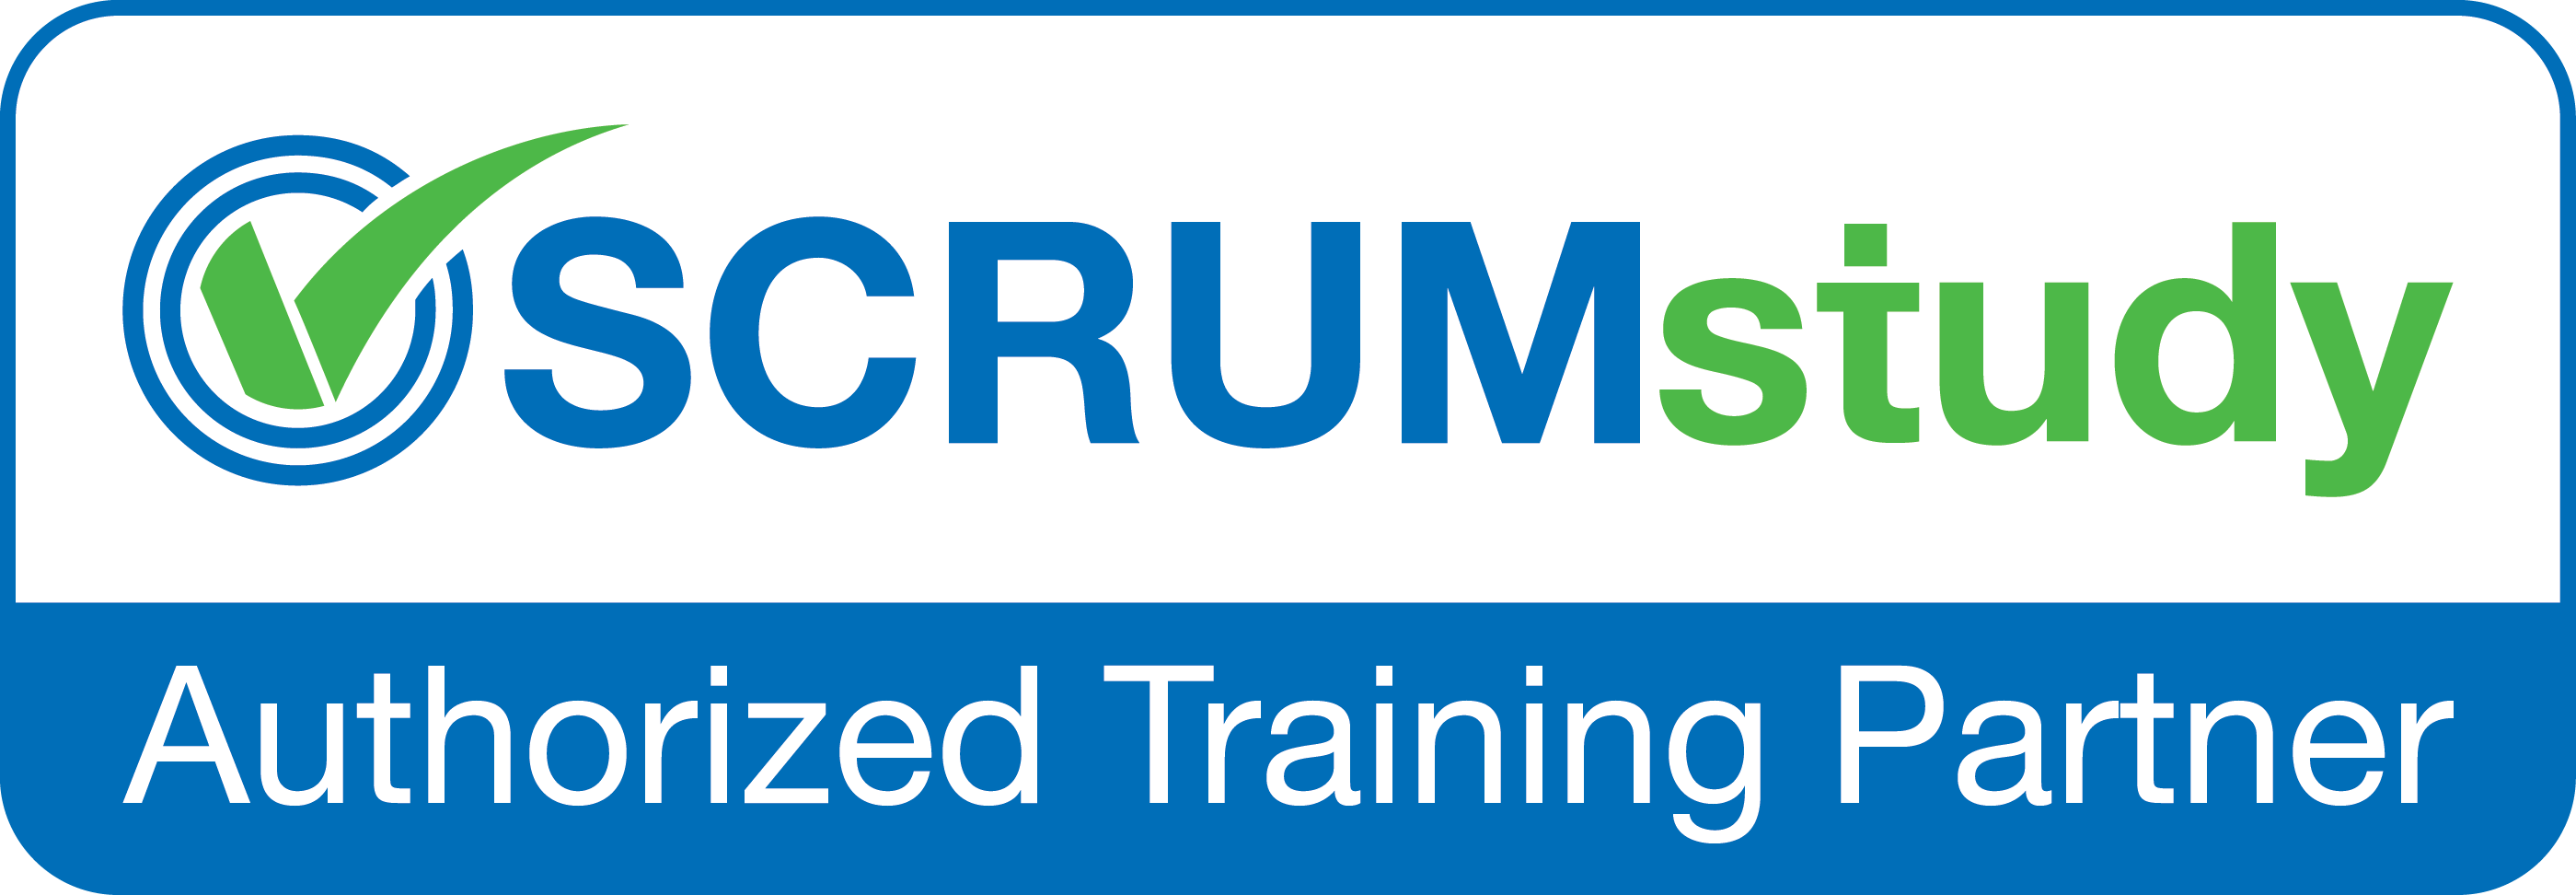 SCRUMstudy Partner Logo